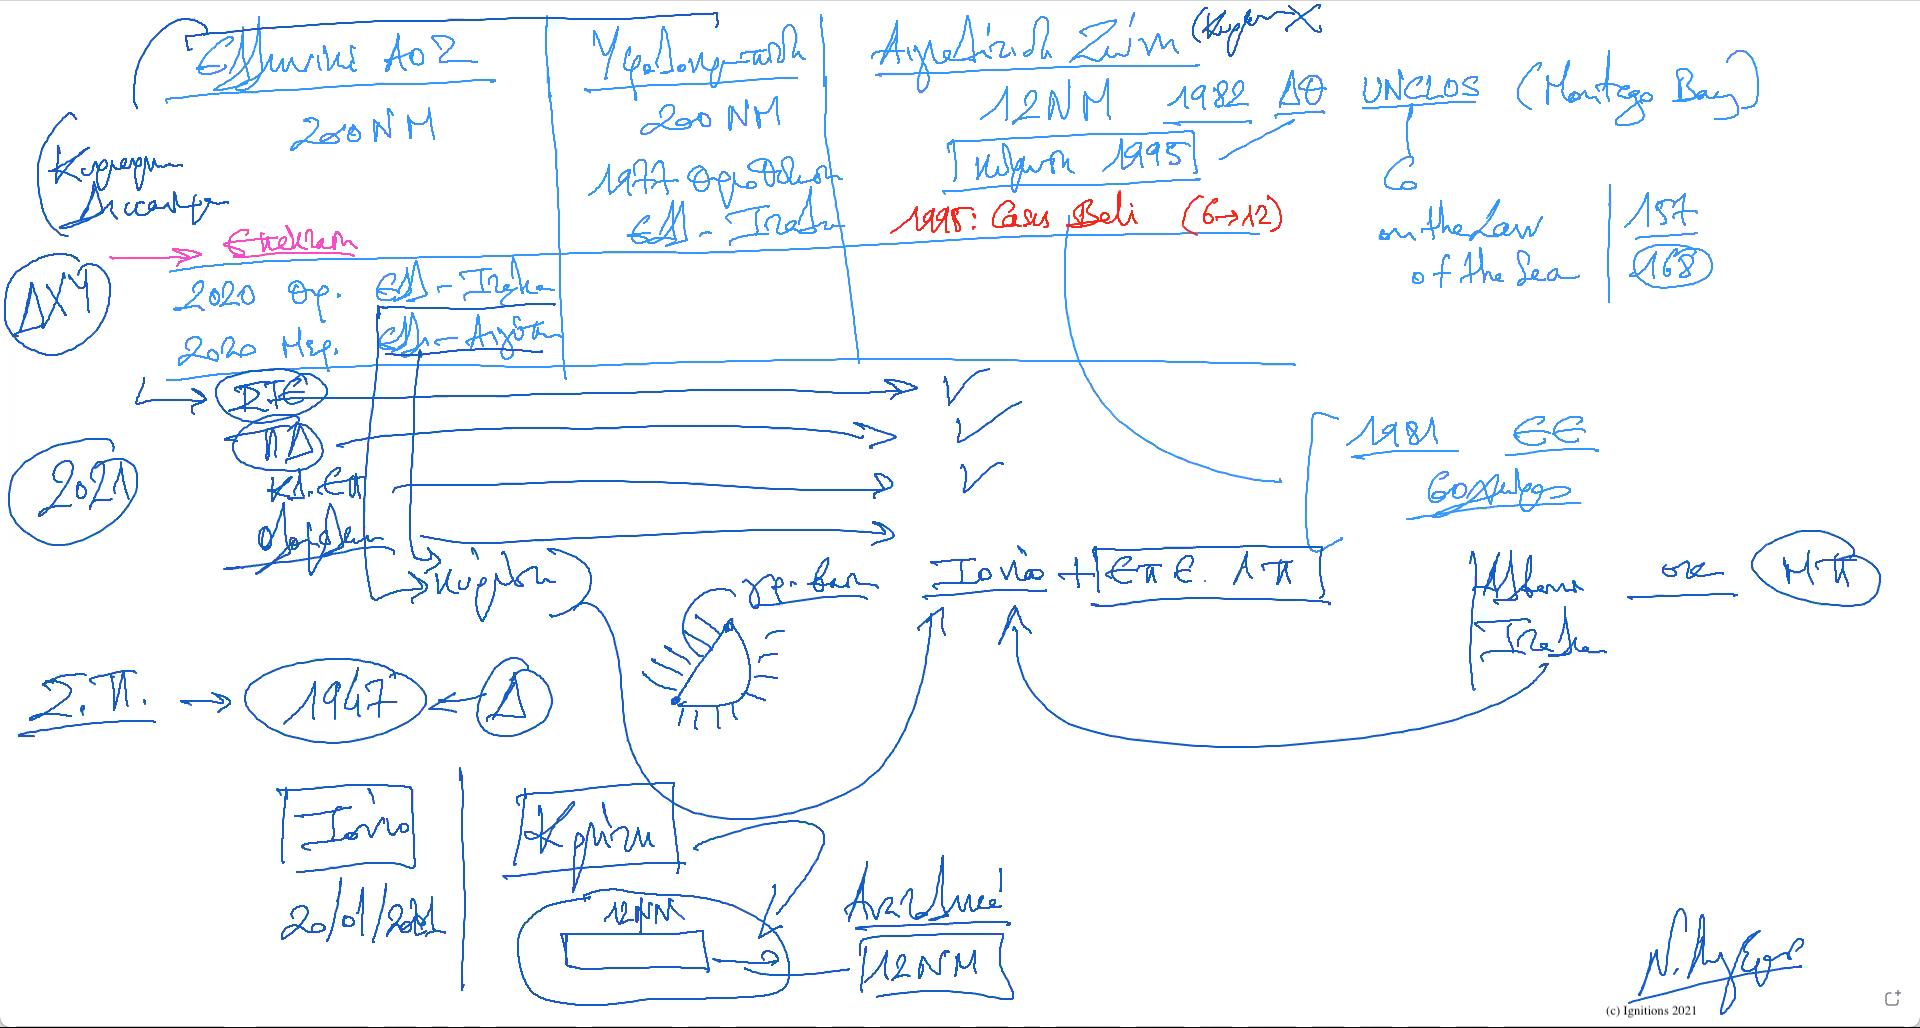 58336 - e-Μάθημα I: ΑΟΖ καιεπέκταση αιγιαλίτιδας ζώνης. (Dessin)